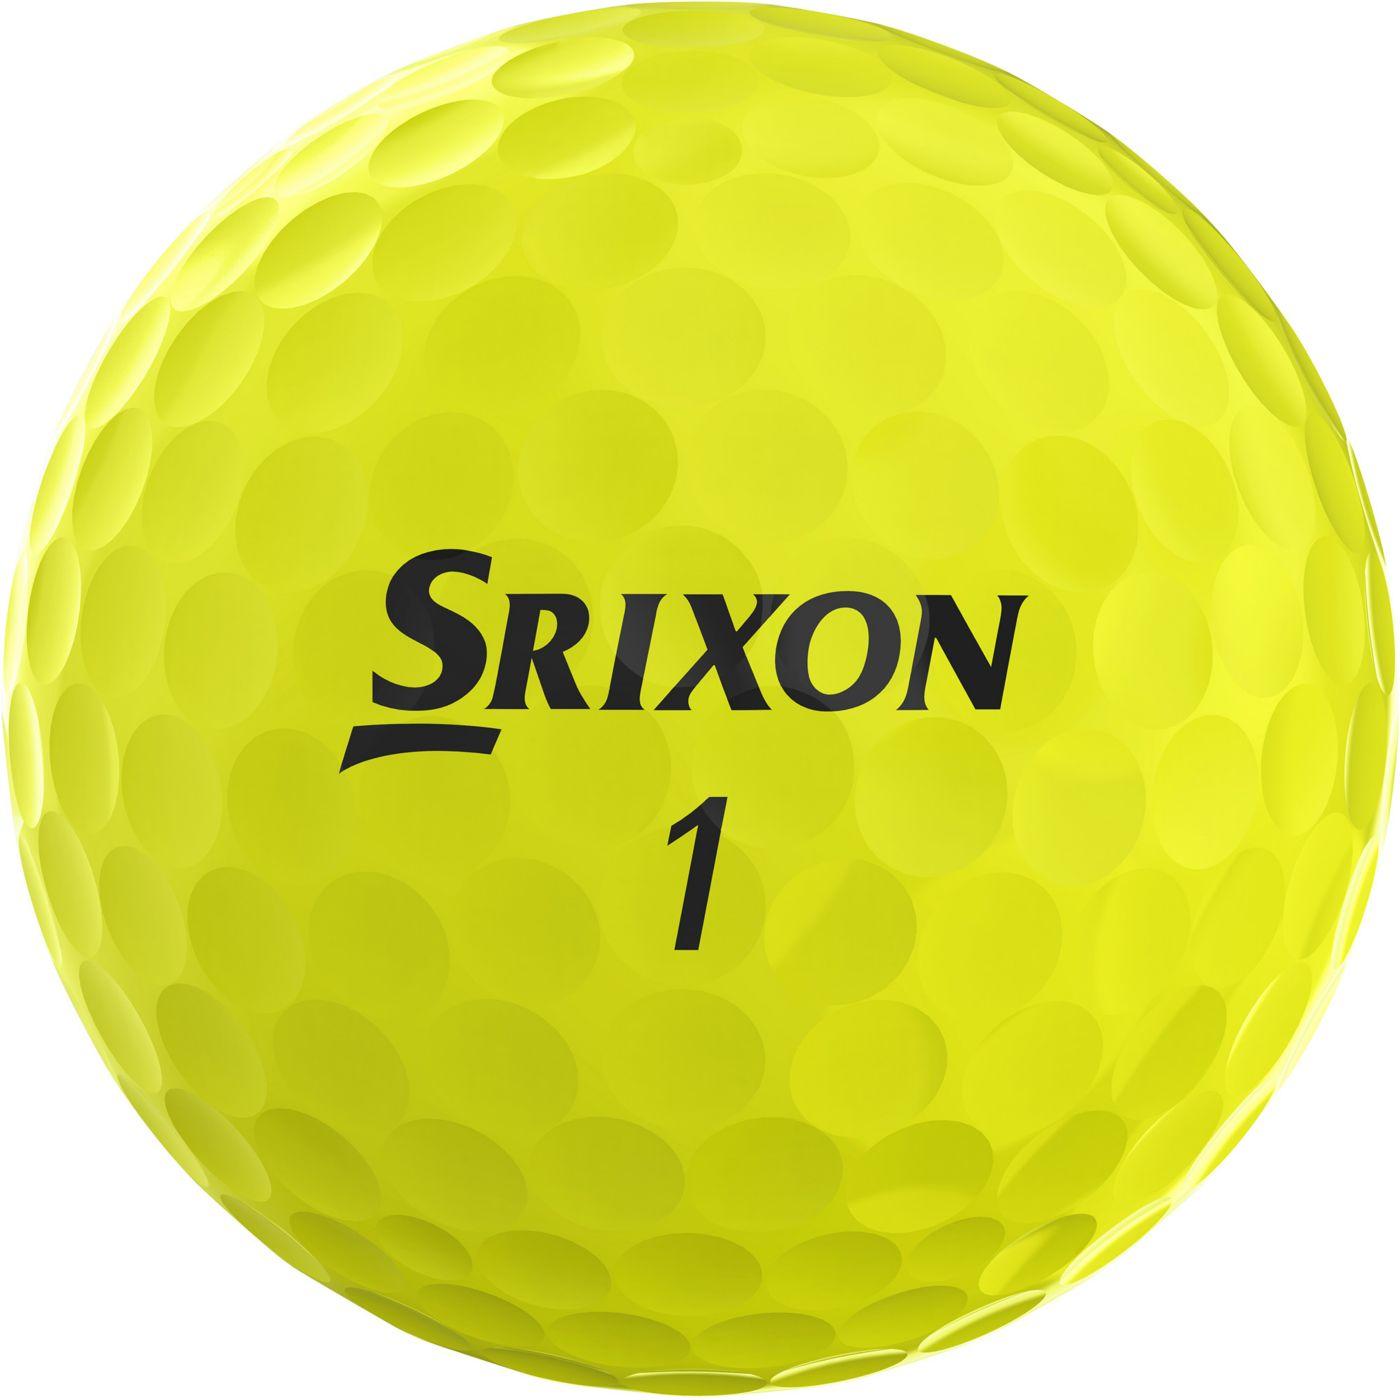 Srixon 2019 Q-STAR Yellow Personalized Golf Balls